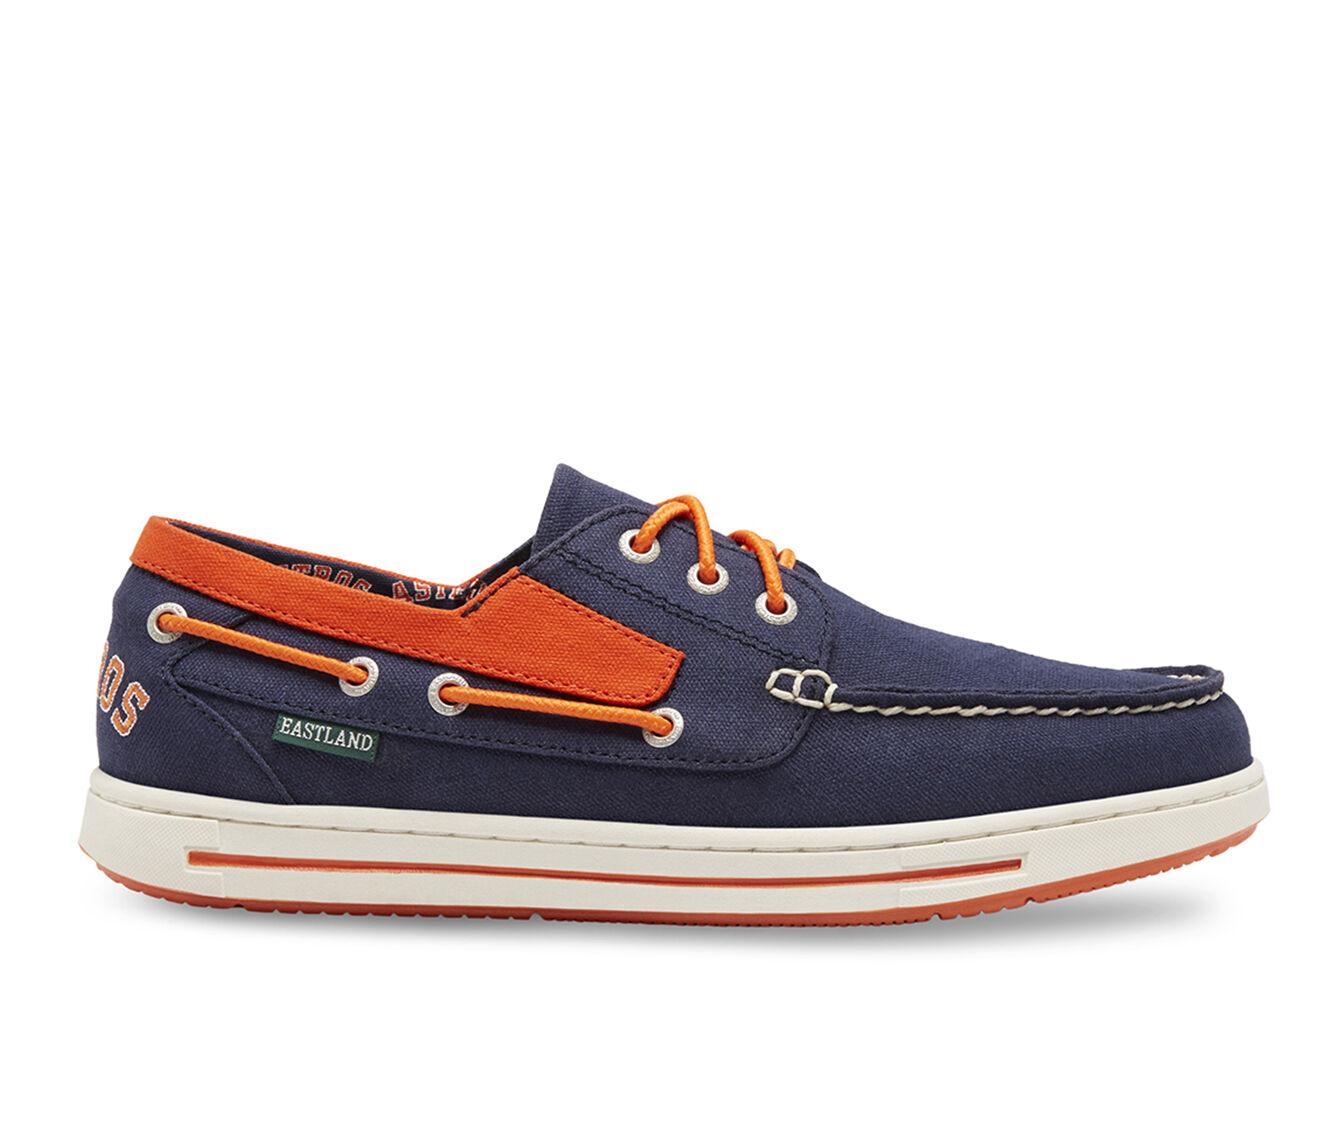 Men's Eastland Adventure MLB Astros Boat Shoes Blue